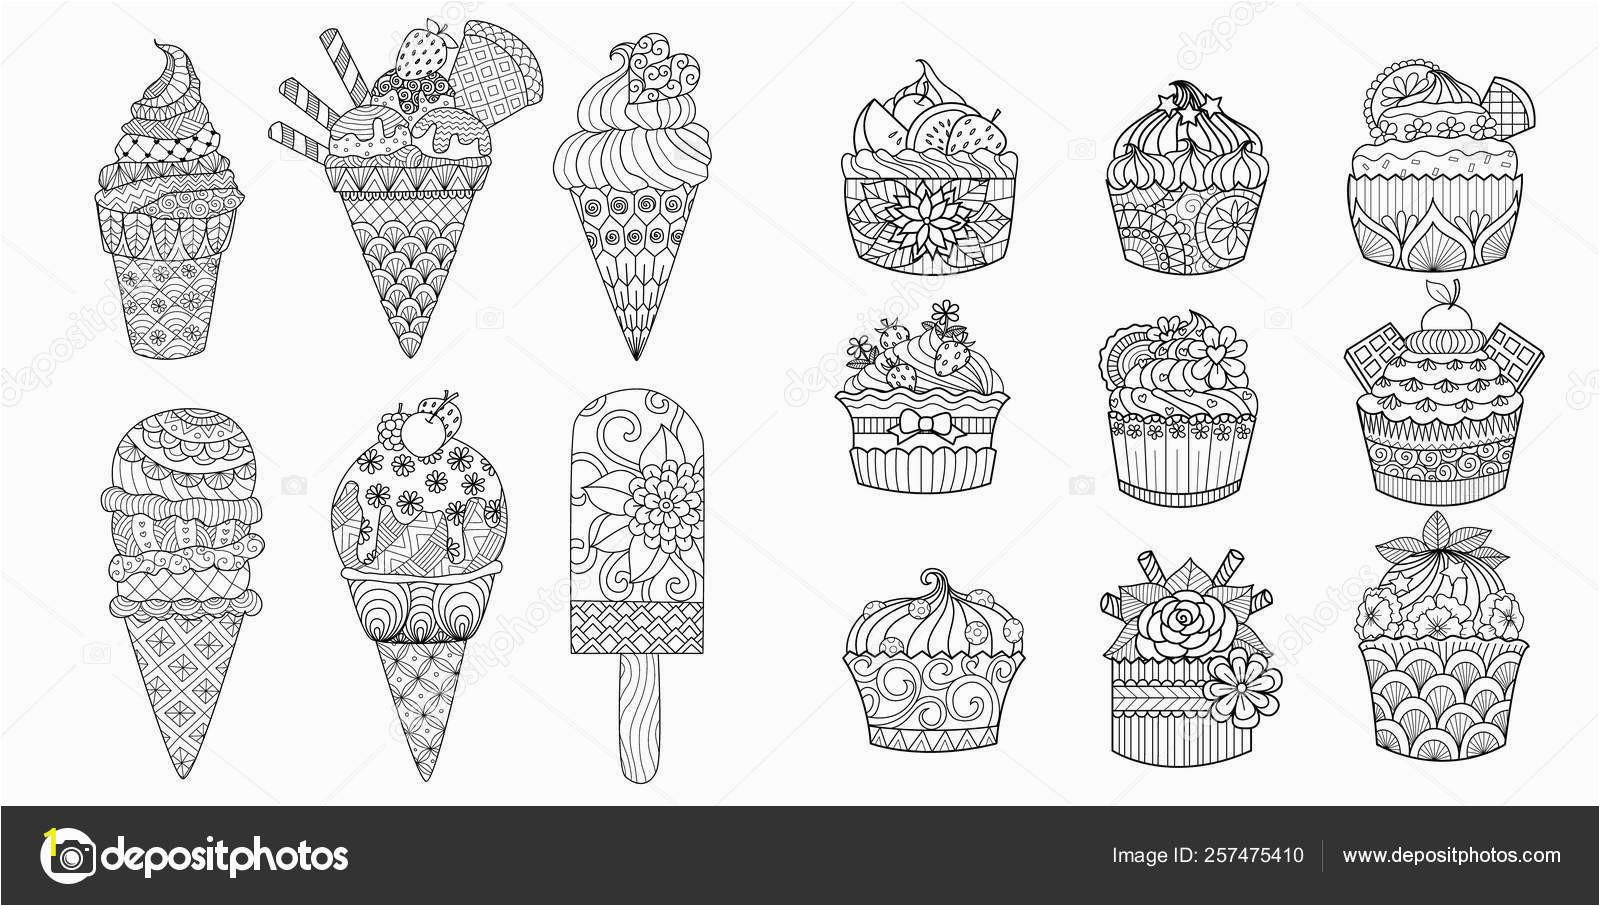 depositphotos stock illustration drawing ice cream cupcakes set